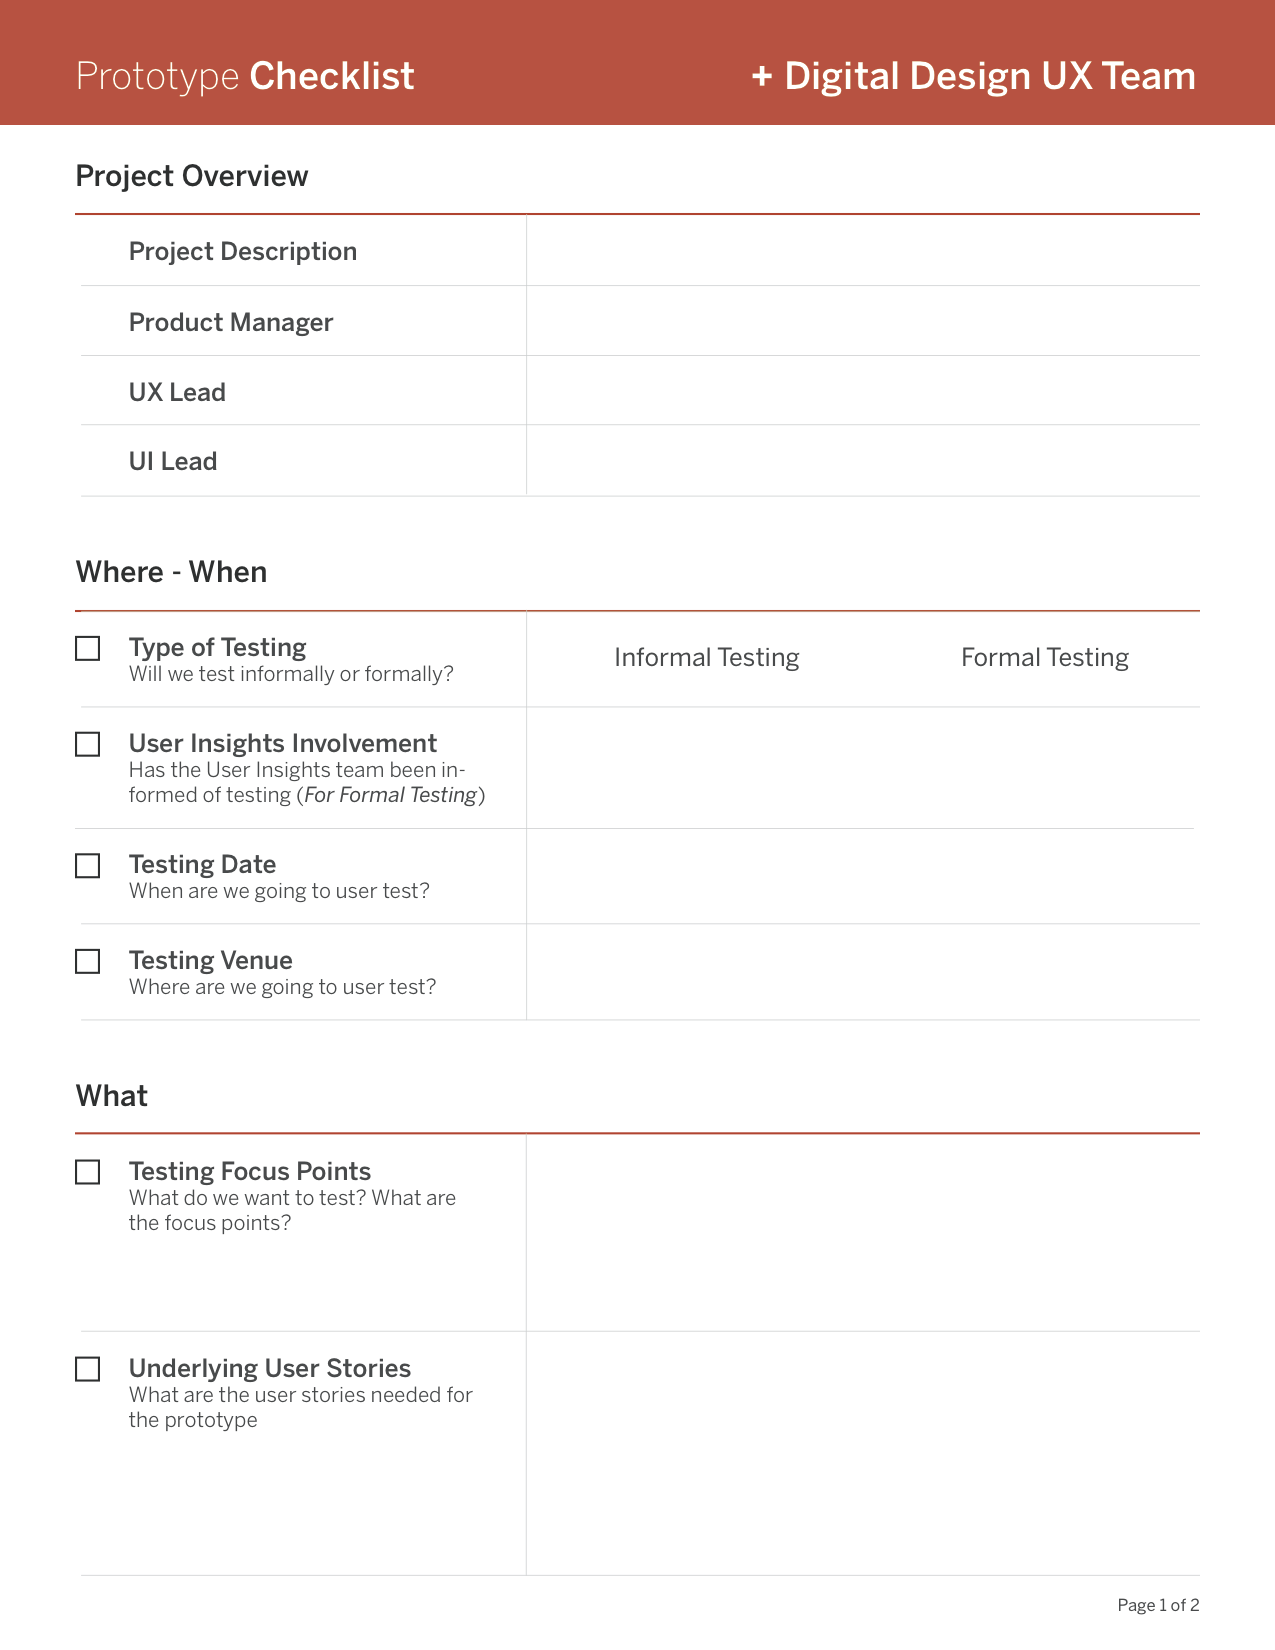 espn-ux-process-prototype-checklist-004.png